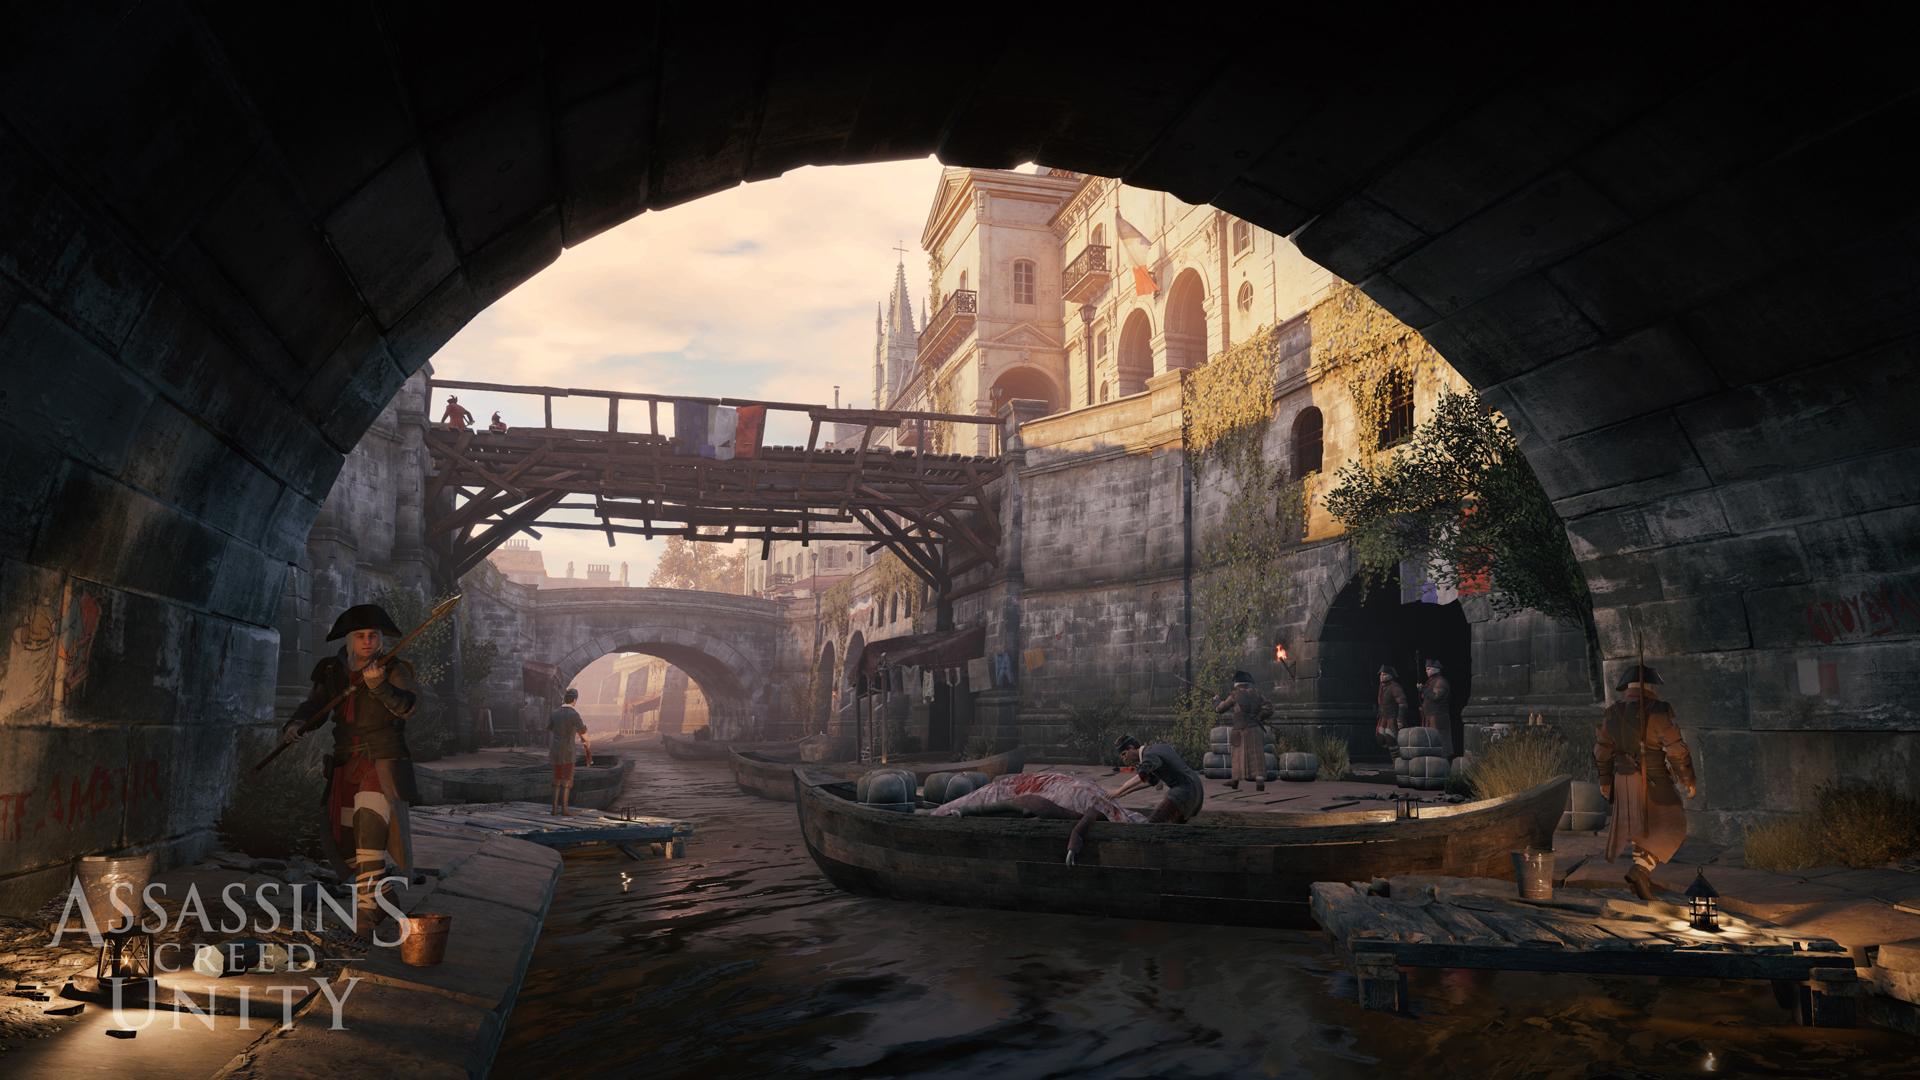 [FIXO] Assassin's Creed Unity Assassin%27s_Creed_Unity_District_IleDeLaCity_166323